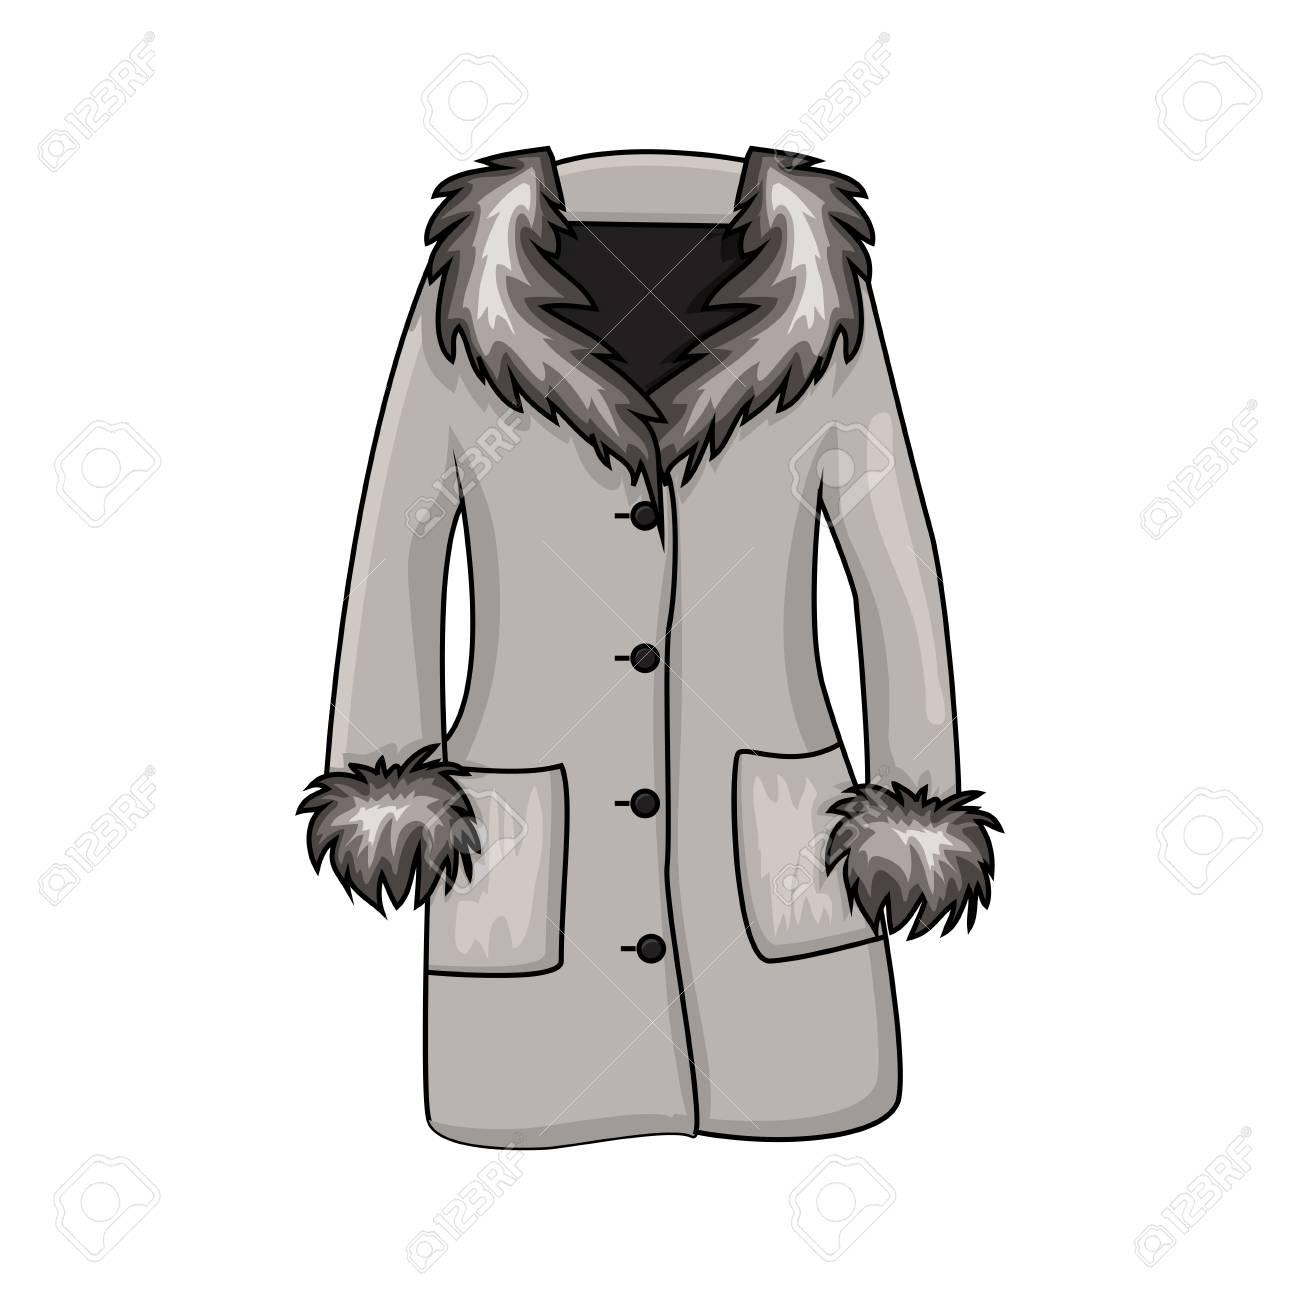 Cartoon fur winter coat isolated on white background - 100874155